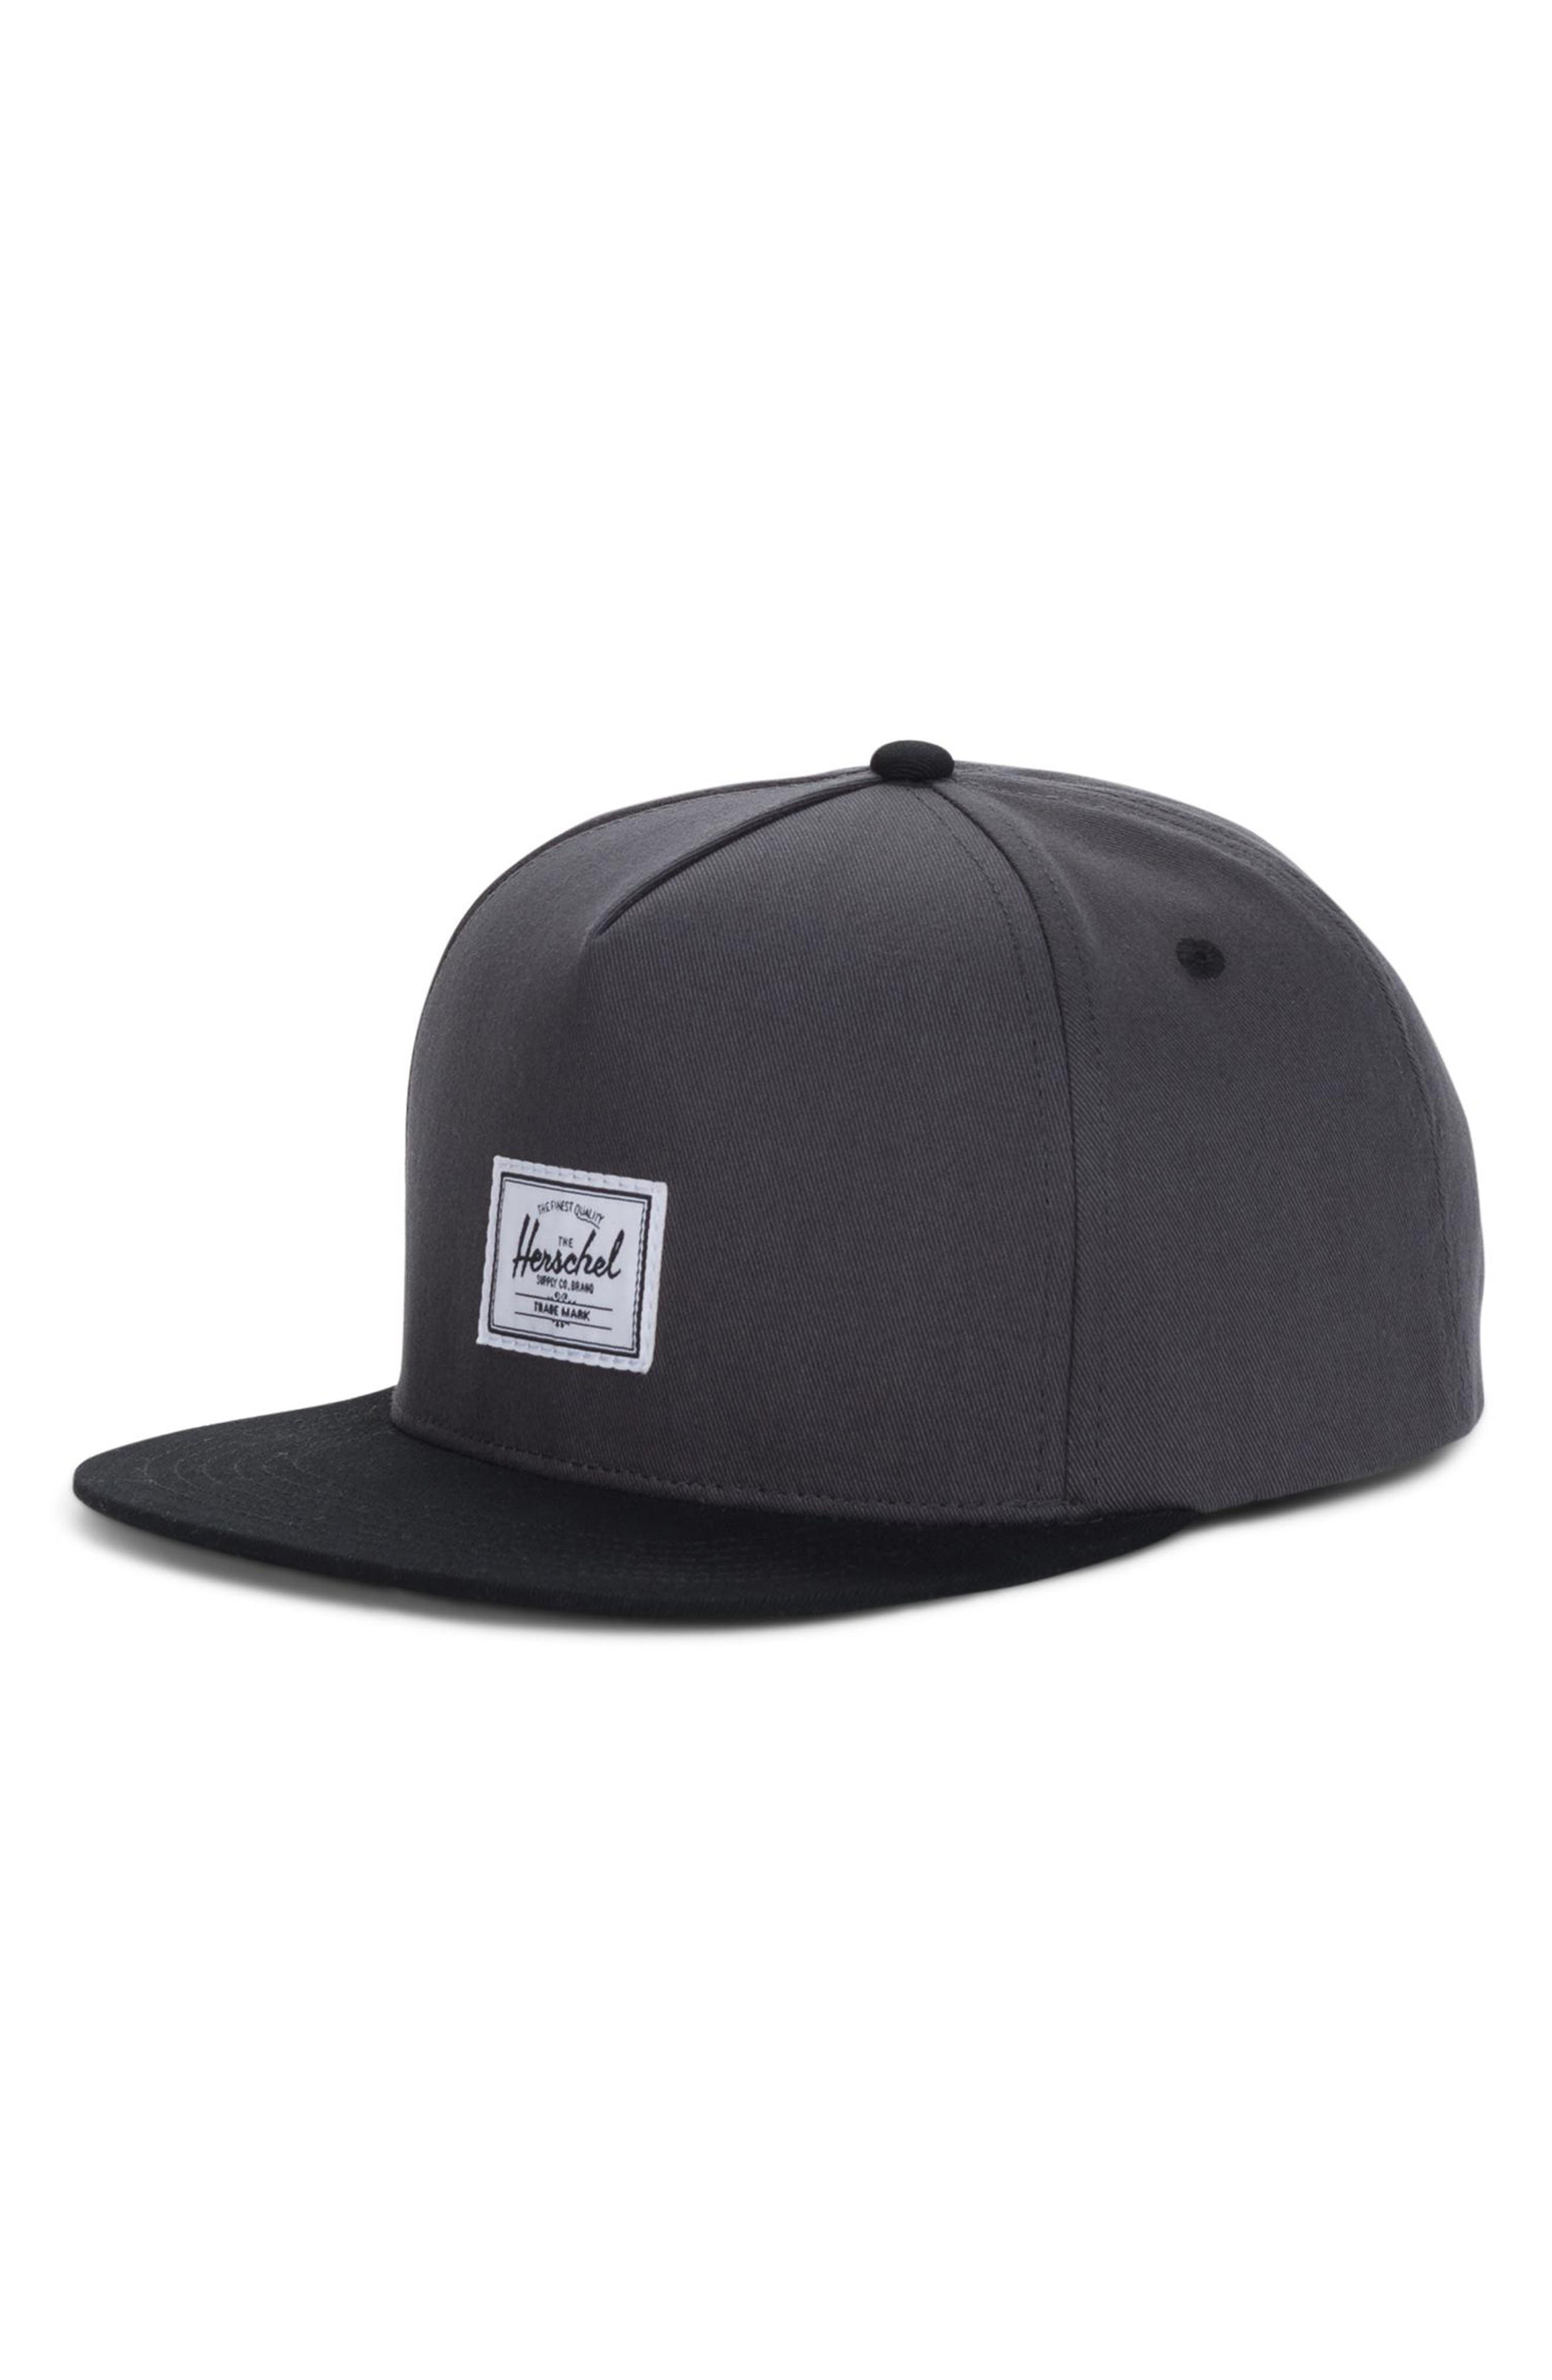 HERSCHEL SUPPLY CO. Dean Multicolor Baseball Cap, Main, color, 020